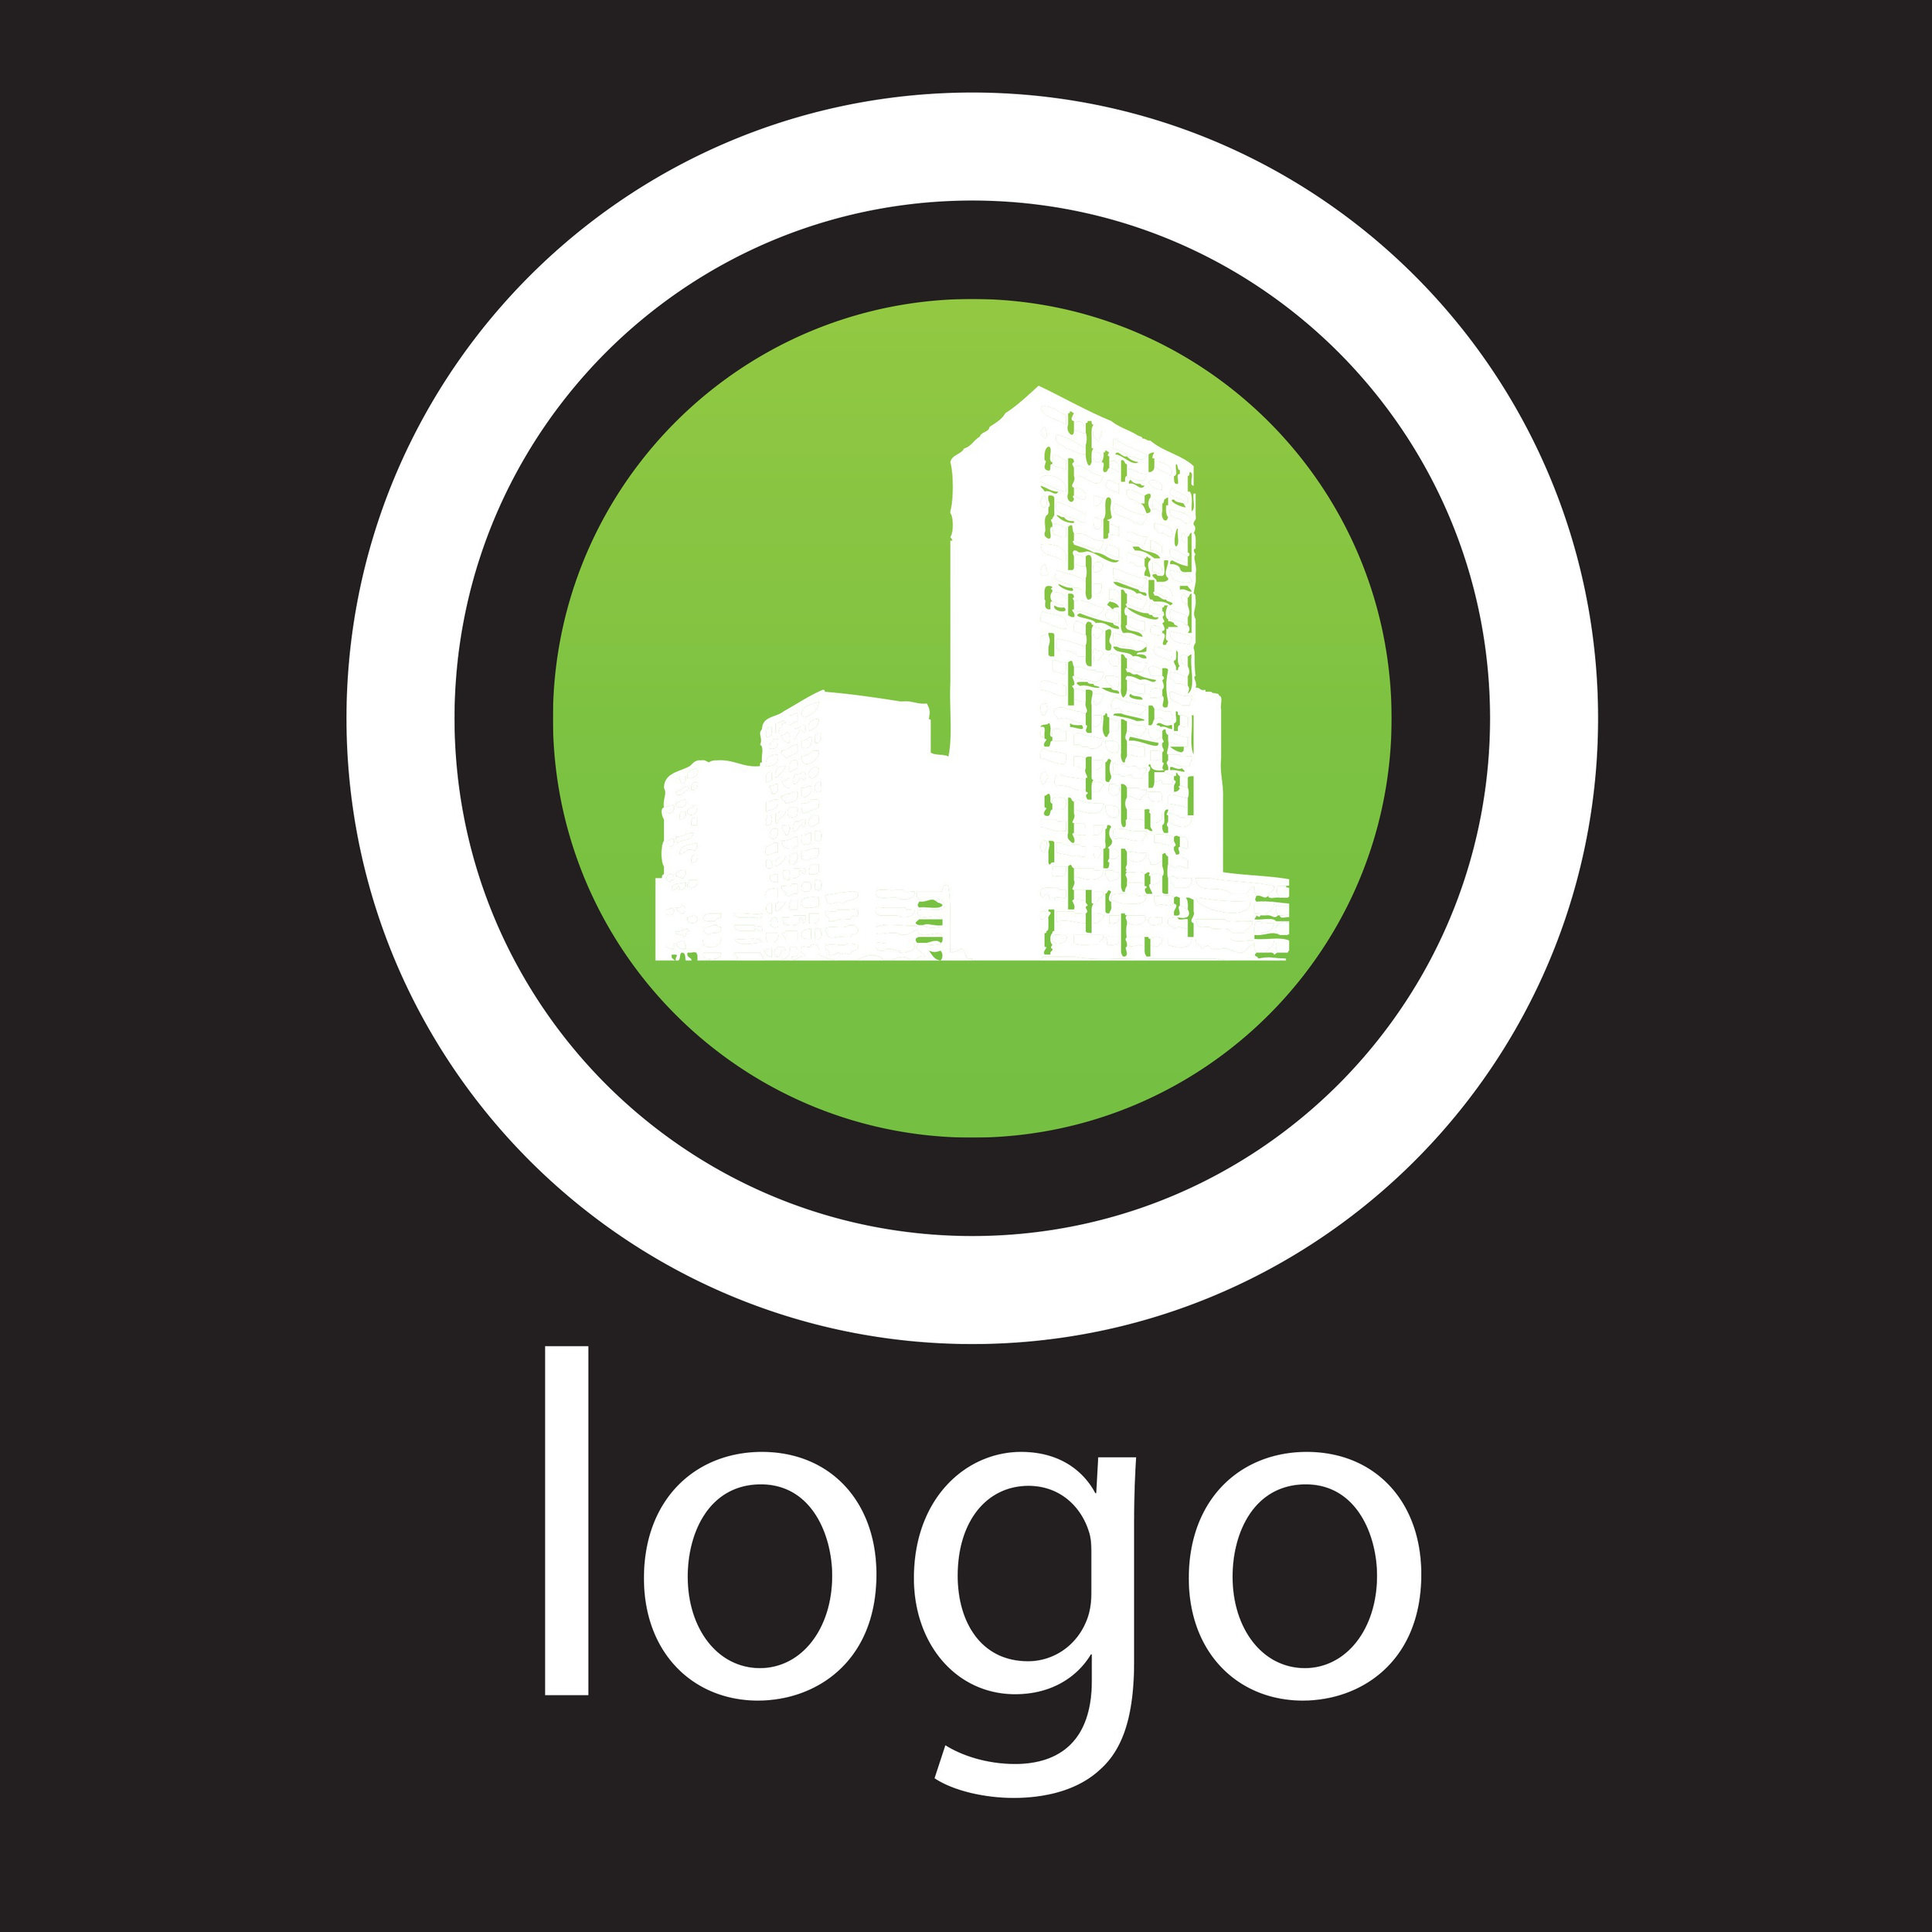 logo_MkWM63BO_L.jpg